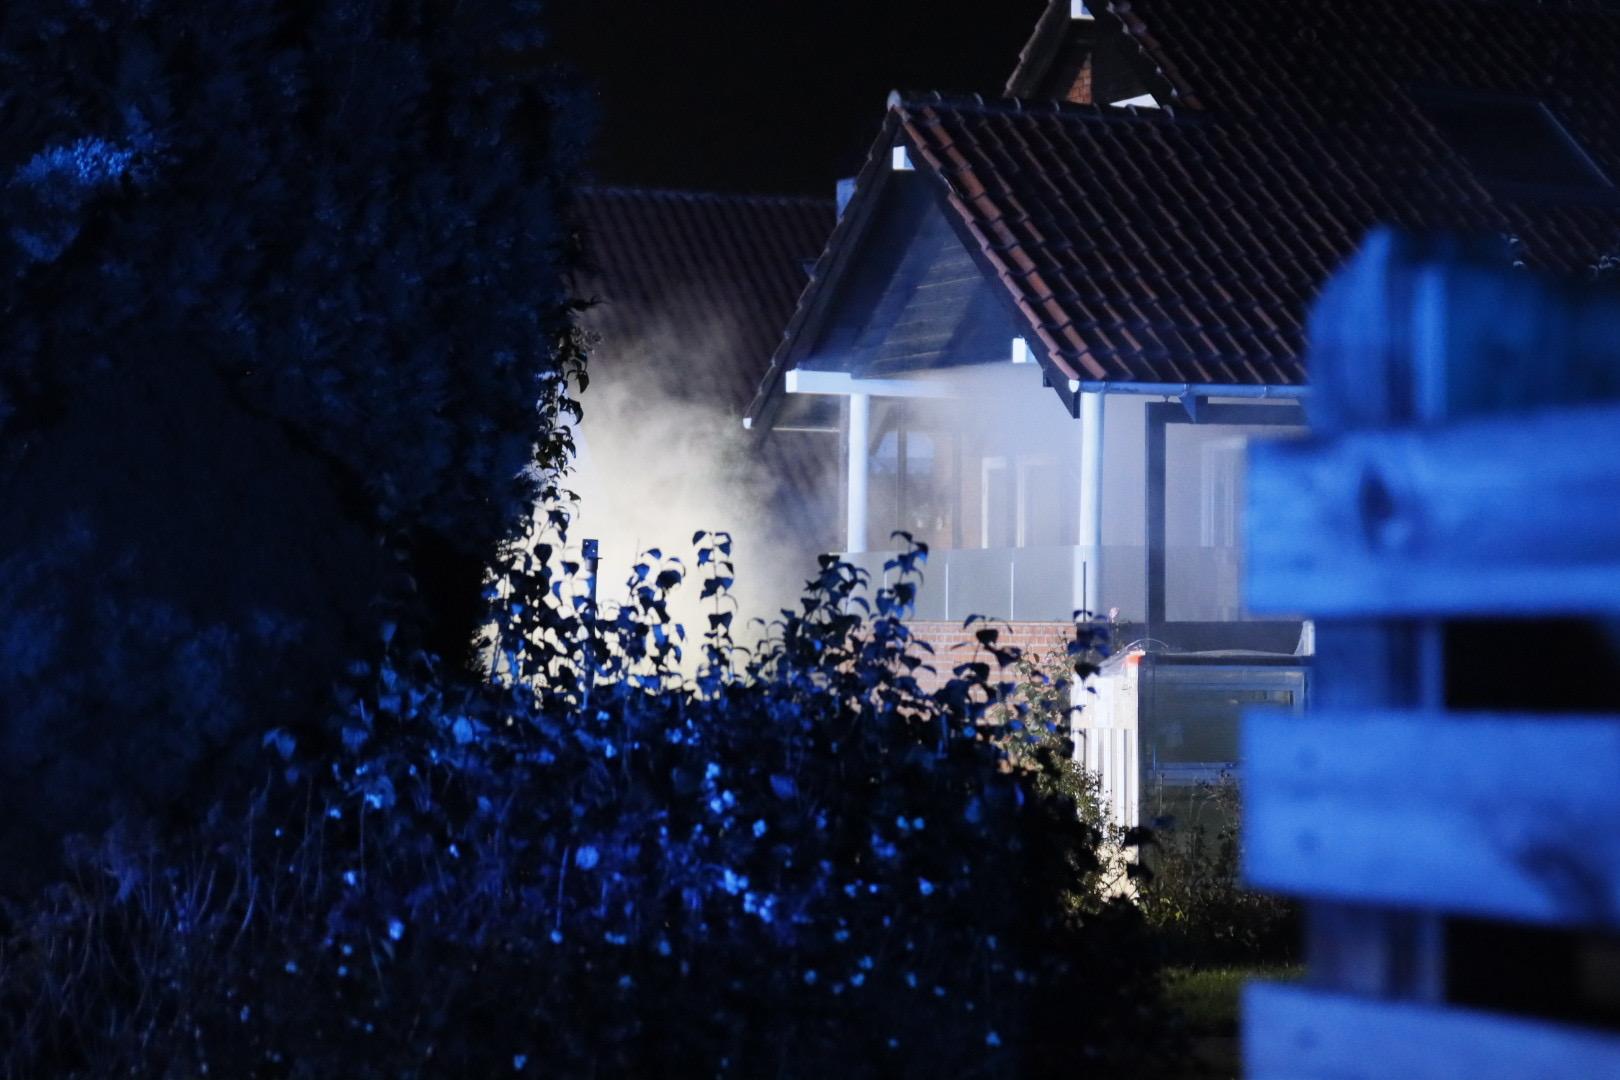 Brand i en villa i Rødovre - Redning fremme